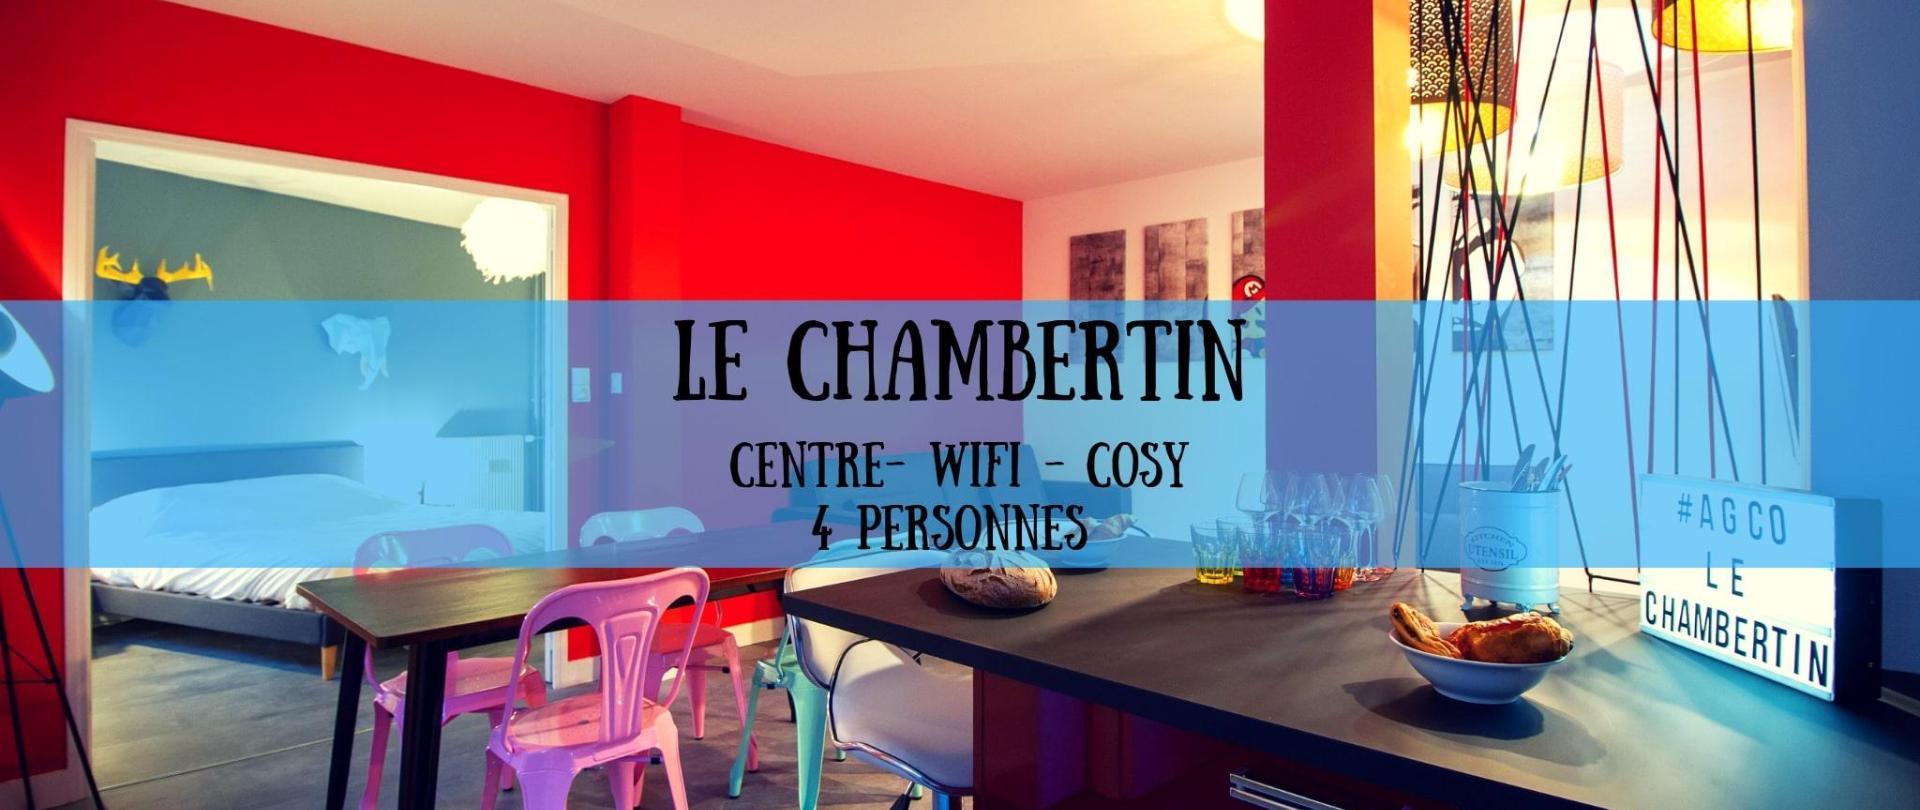 LE CHAMBERTIN DIJON-TOURISME